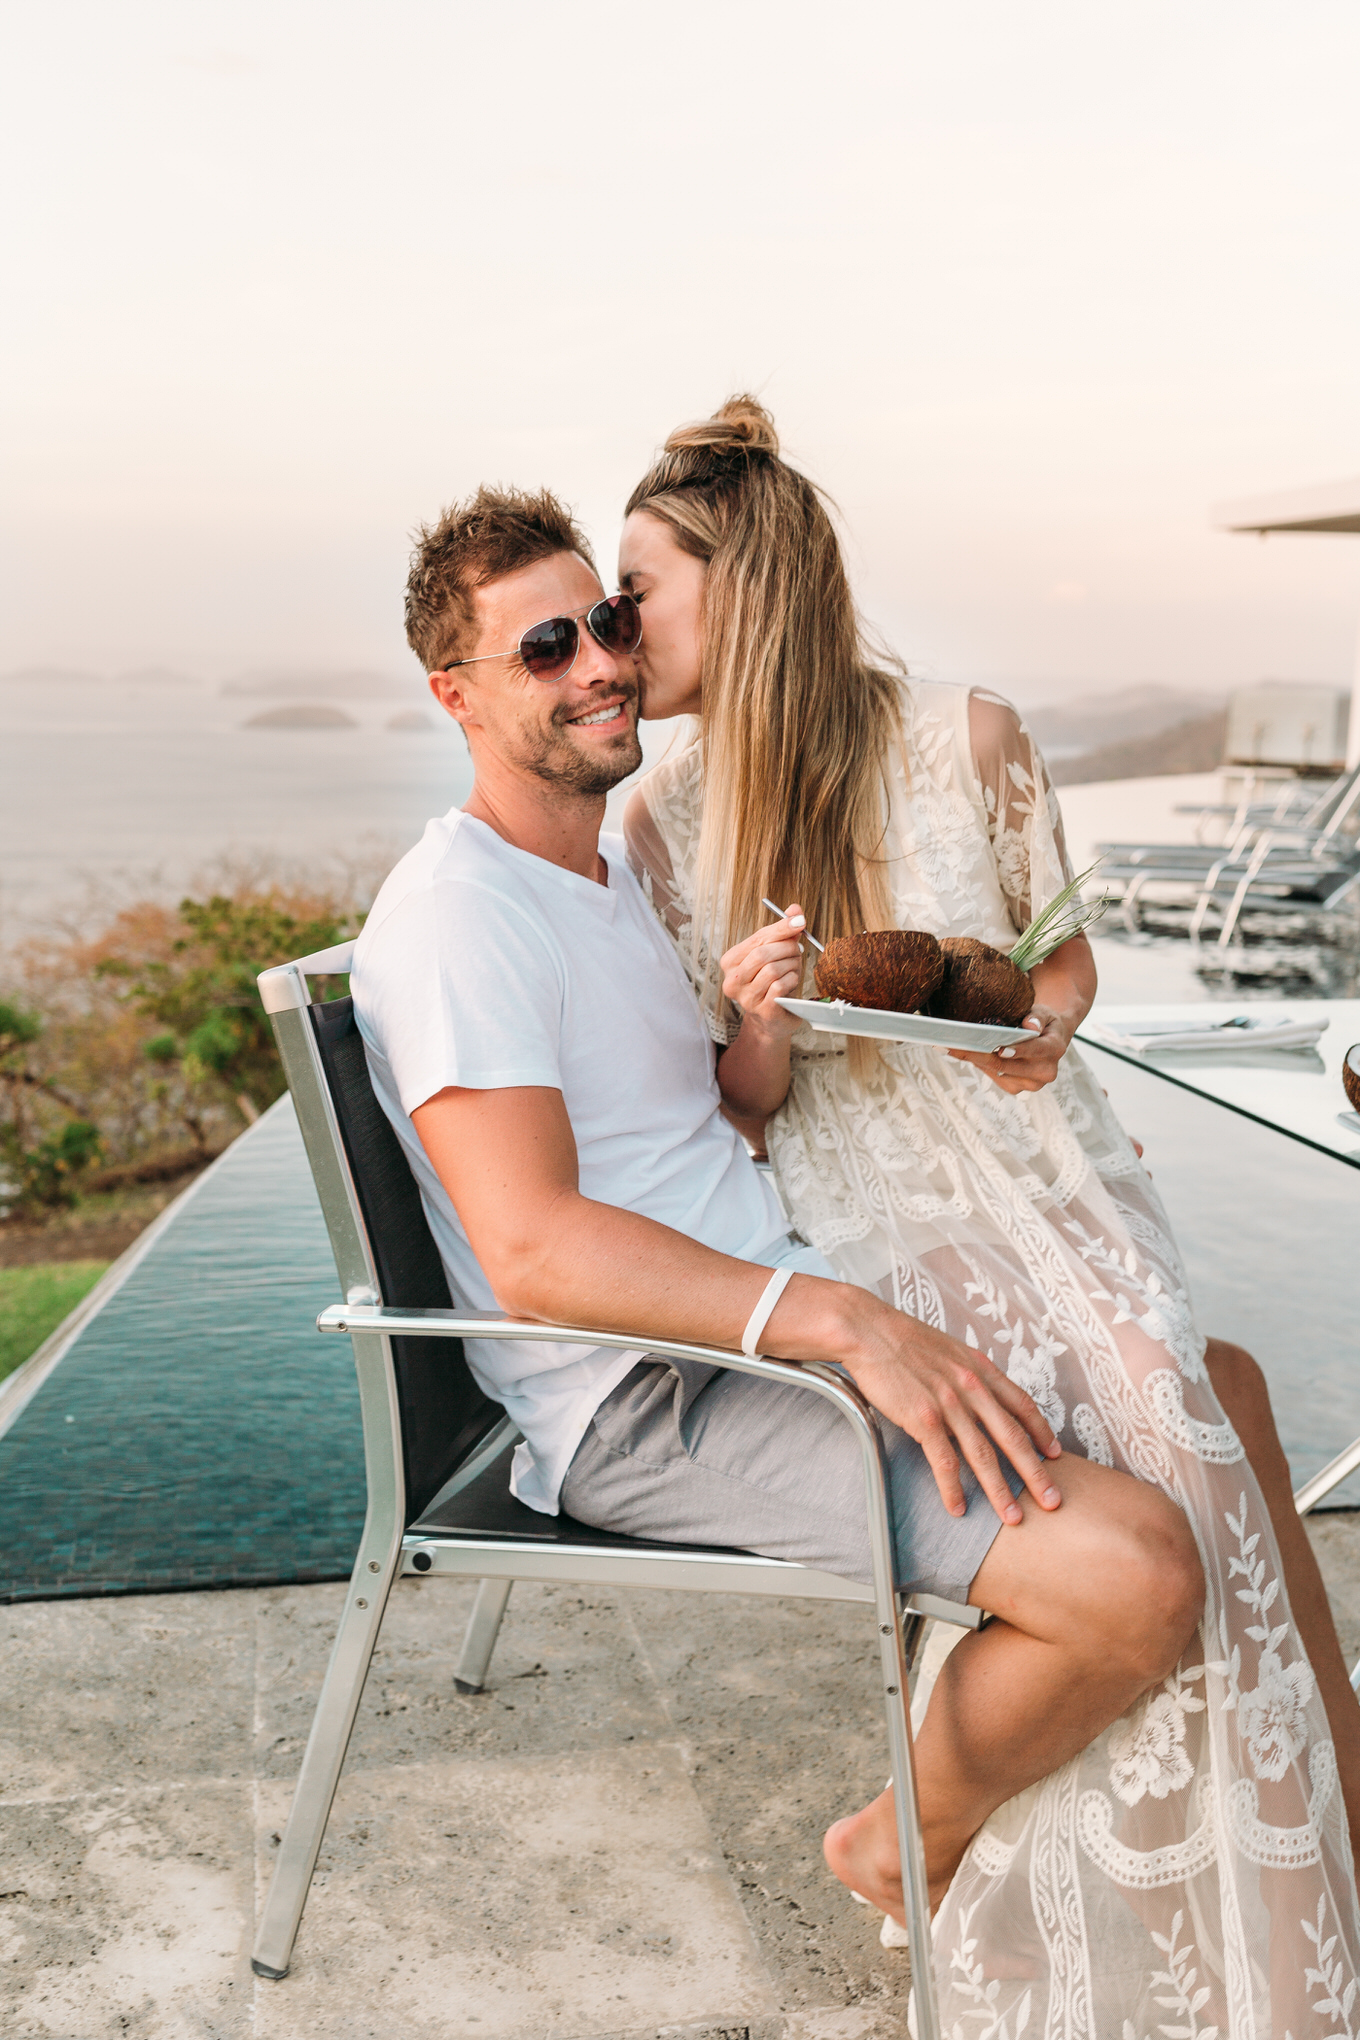 Costa rica dating